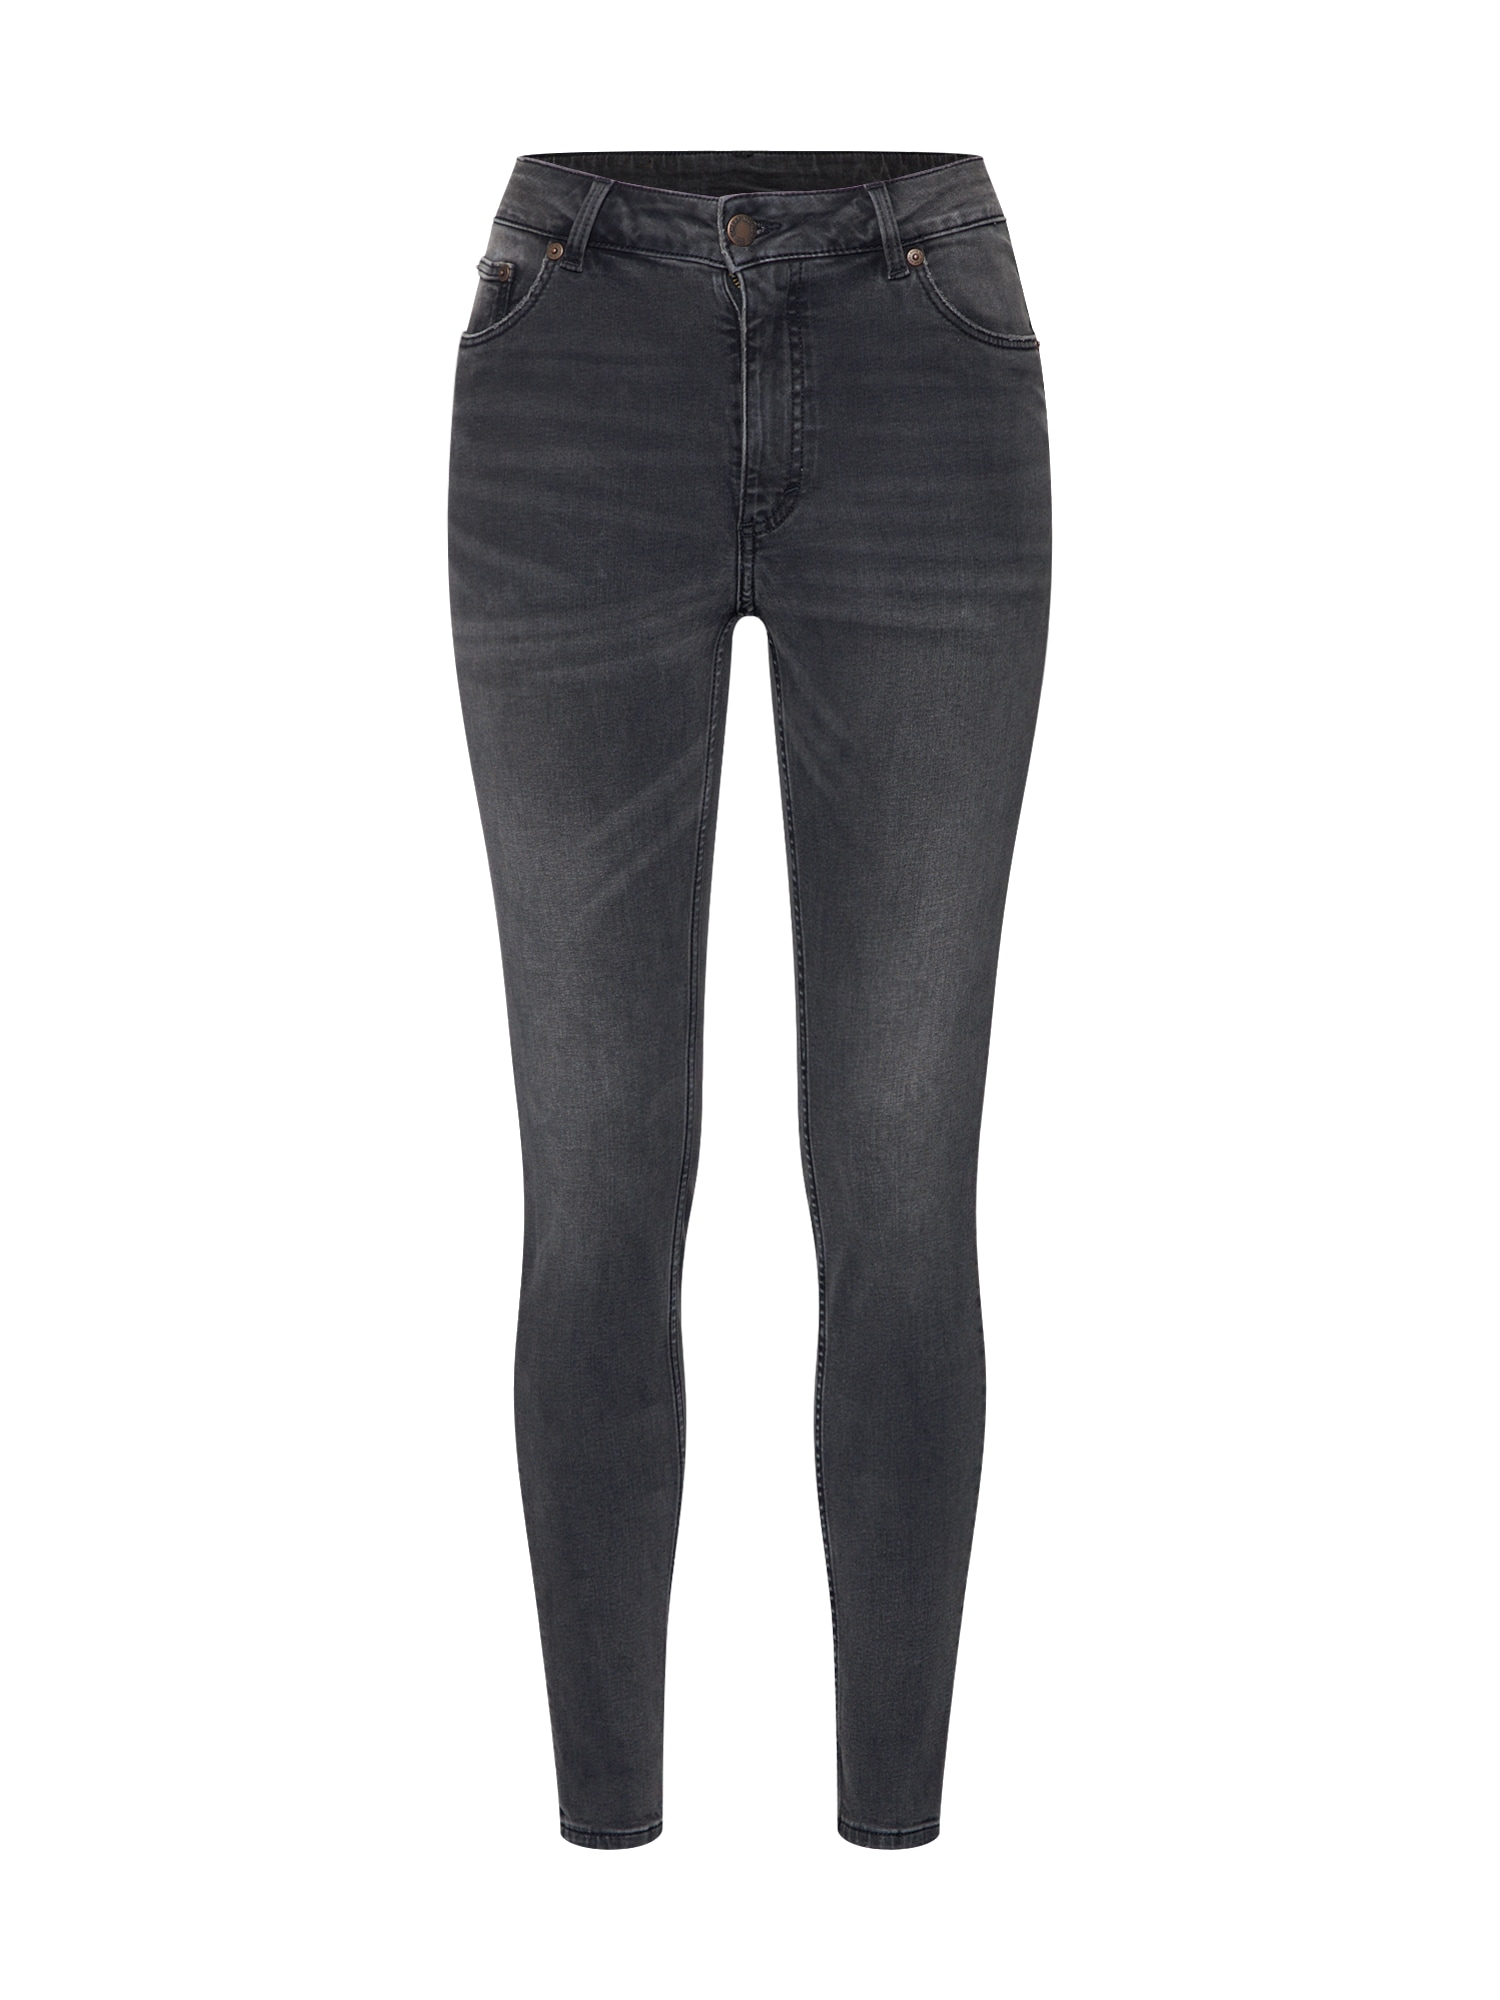 CHEAP MONDAY Dames Jeans High Skin donkergrijs